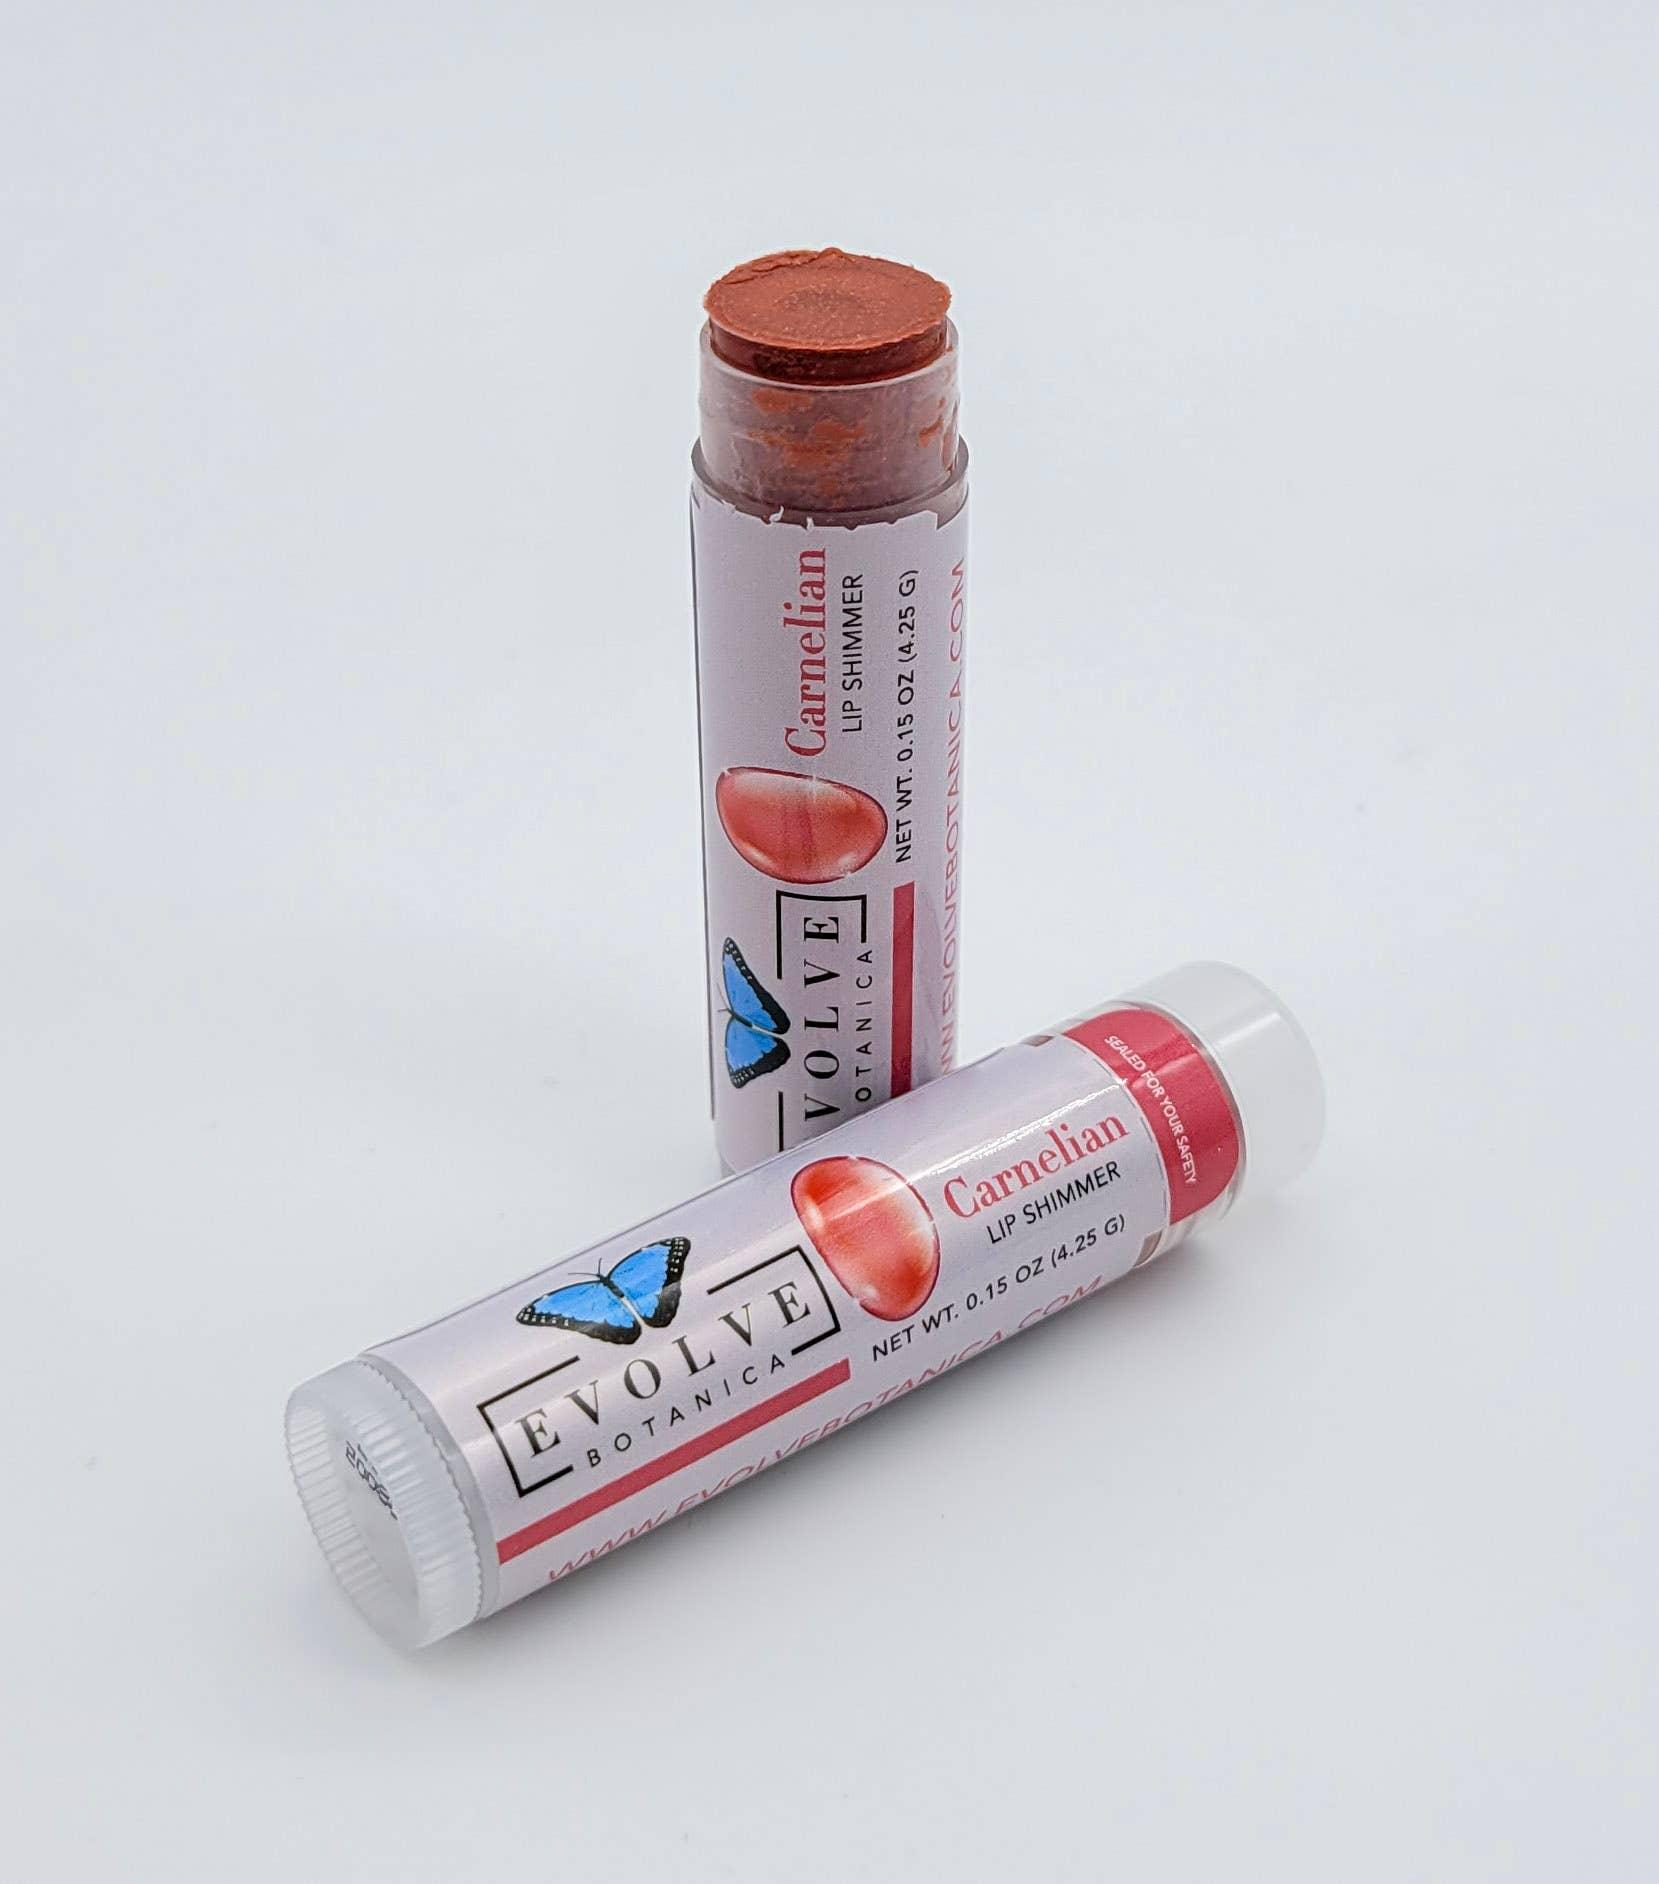 Evolve - Lip Balm - Natural Shimmer Tint - Carnelian | Trada Marketplace